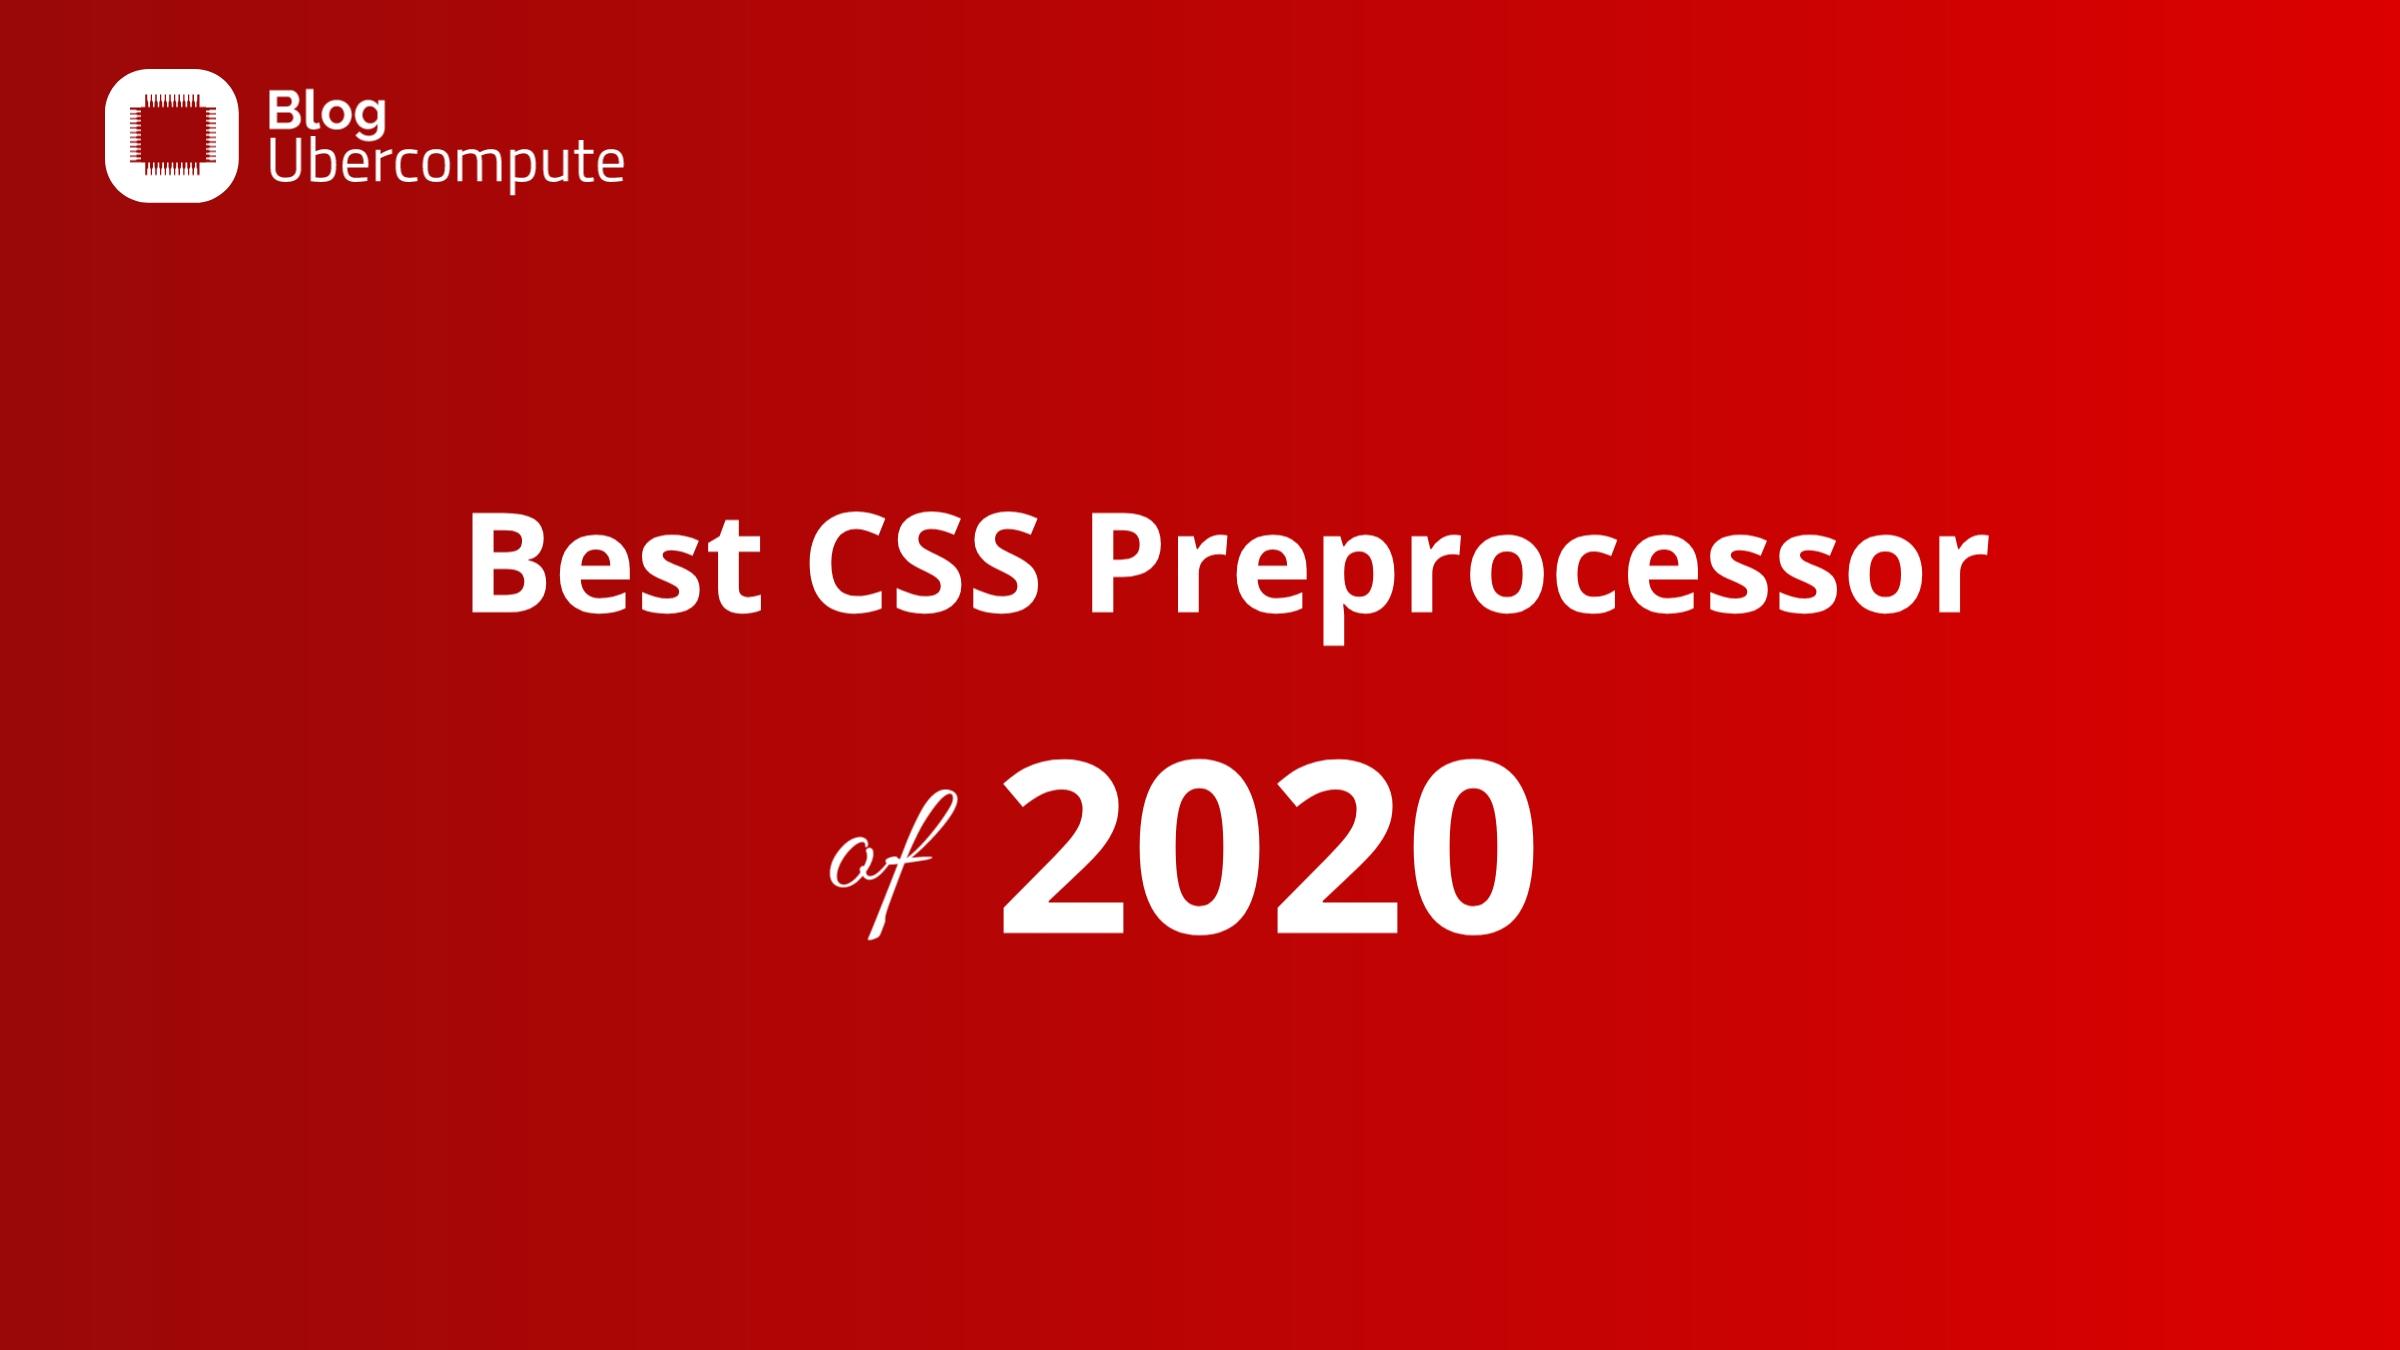 Best CSS Preprocessor of 2020